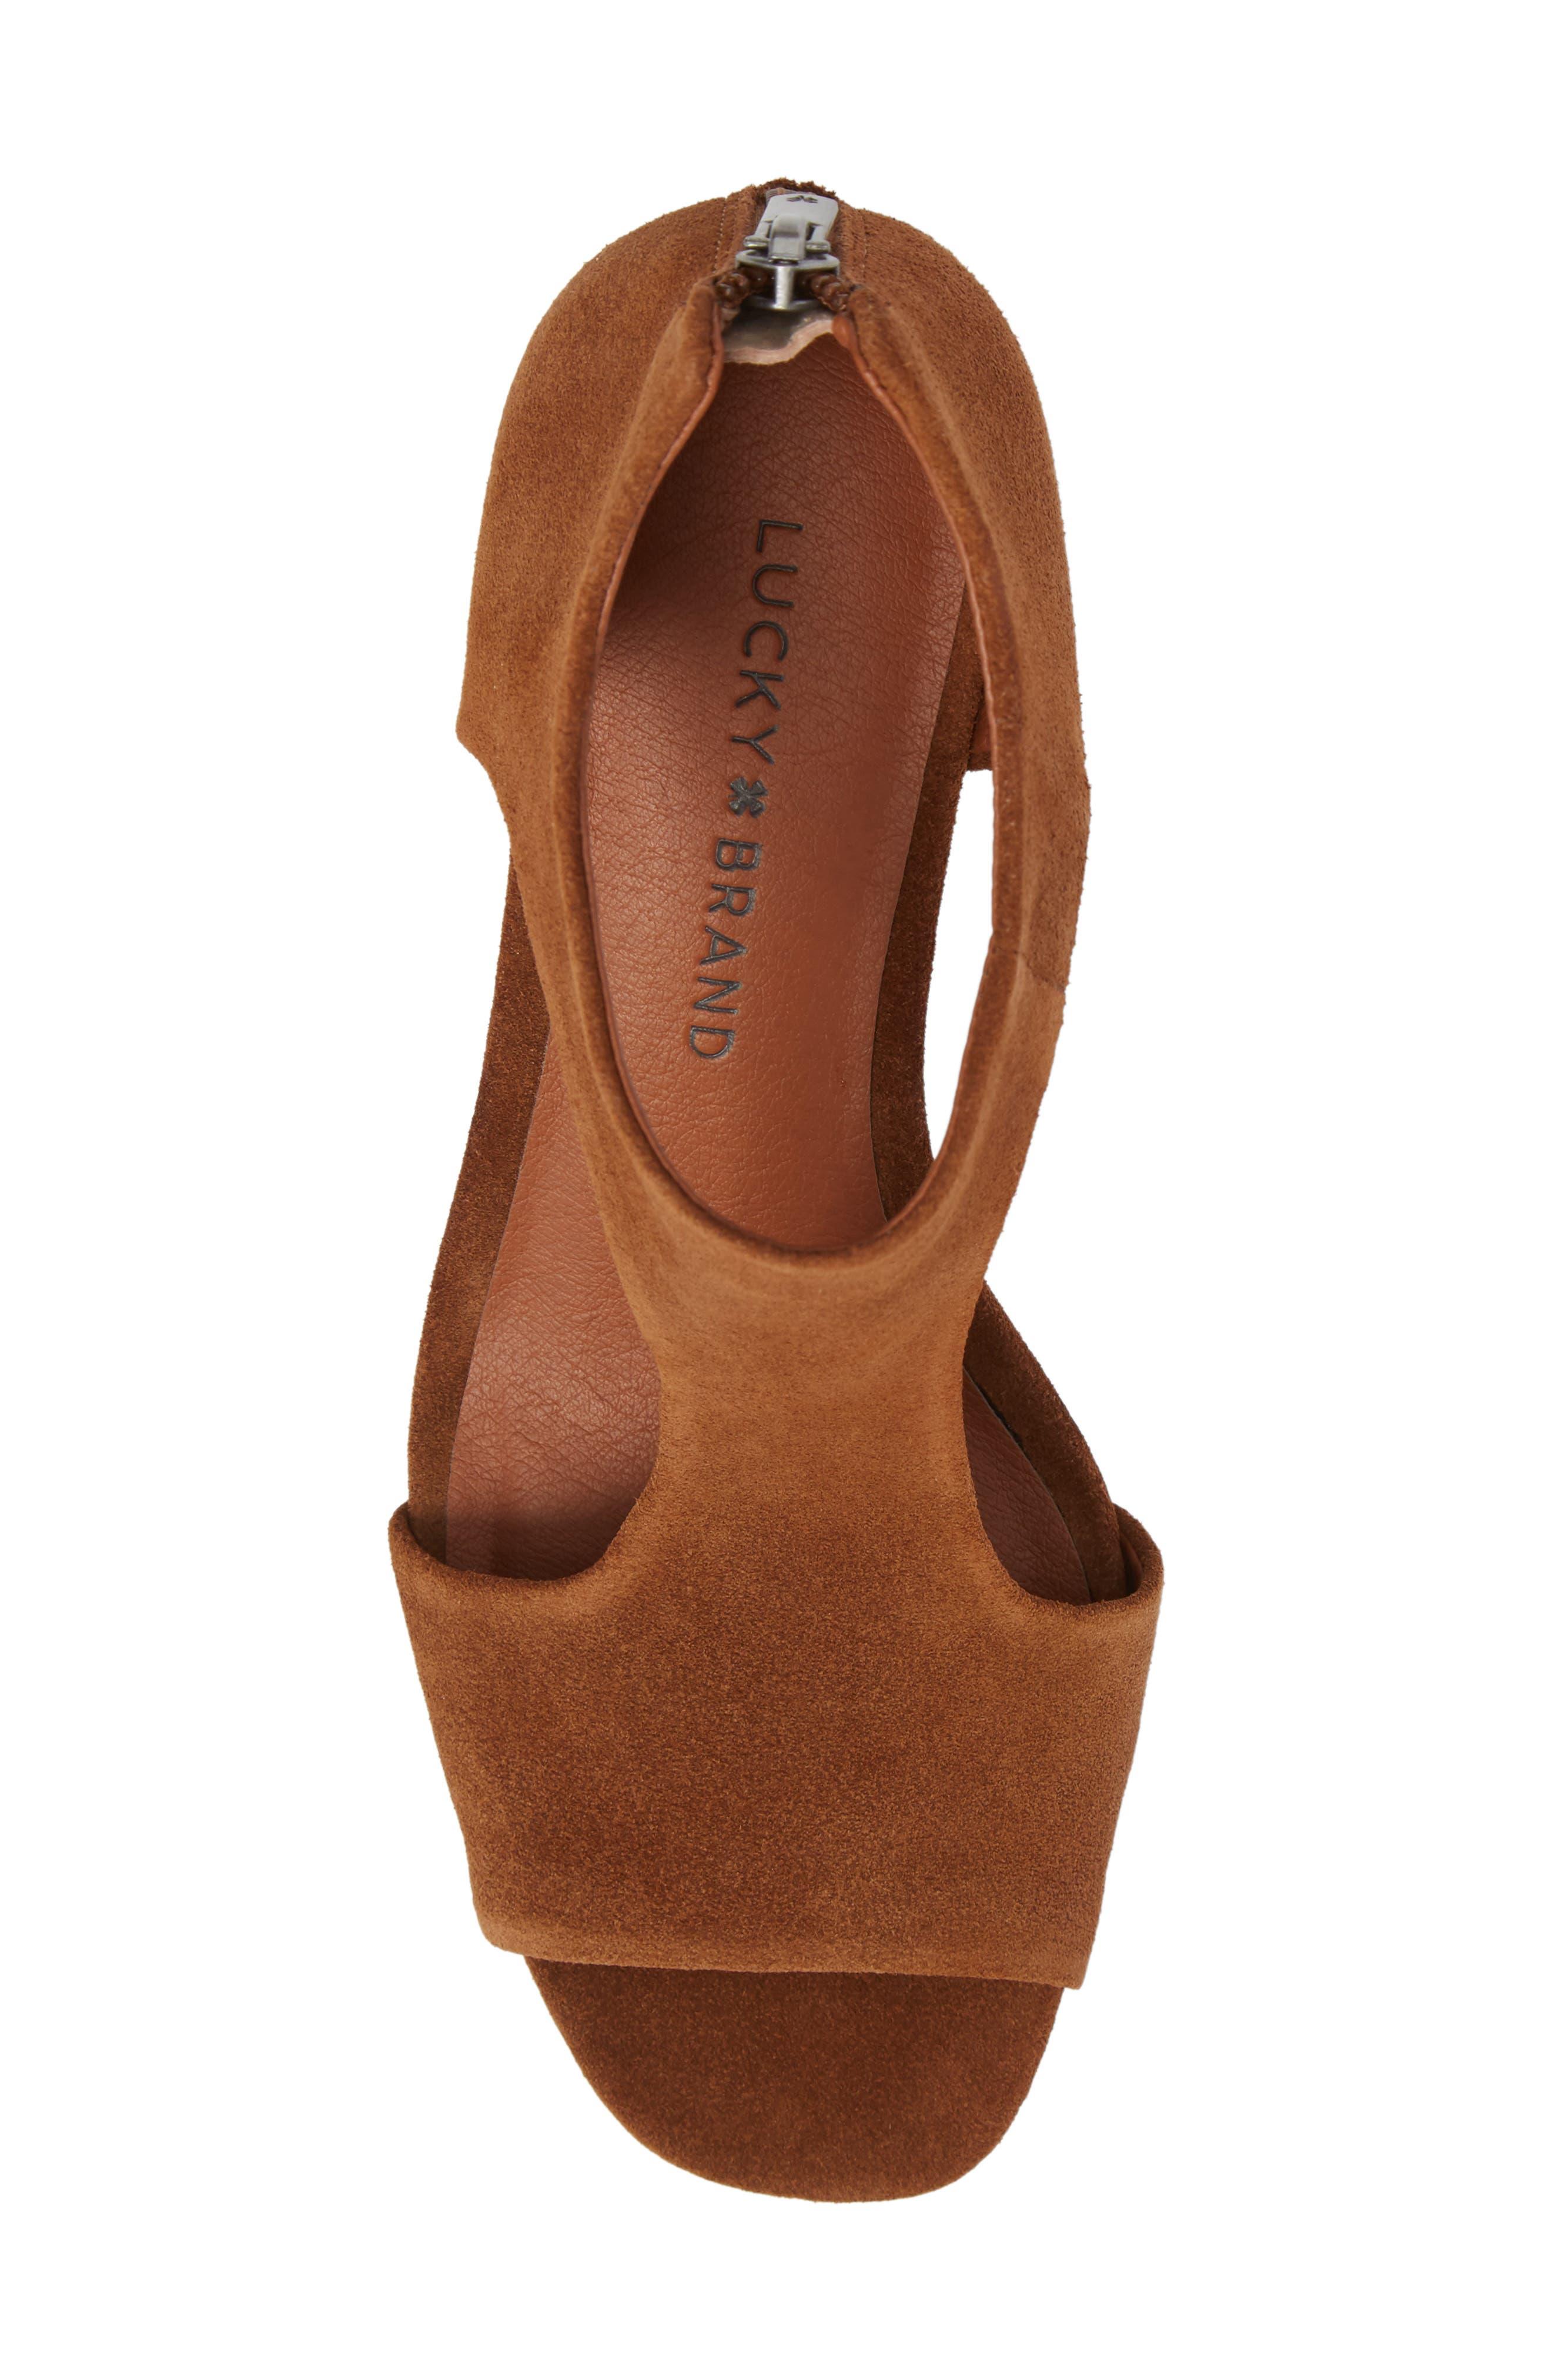 Tehirr Wedge Sandal,                             Alternate thumbnail 5, color,                             Cedar Suede